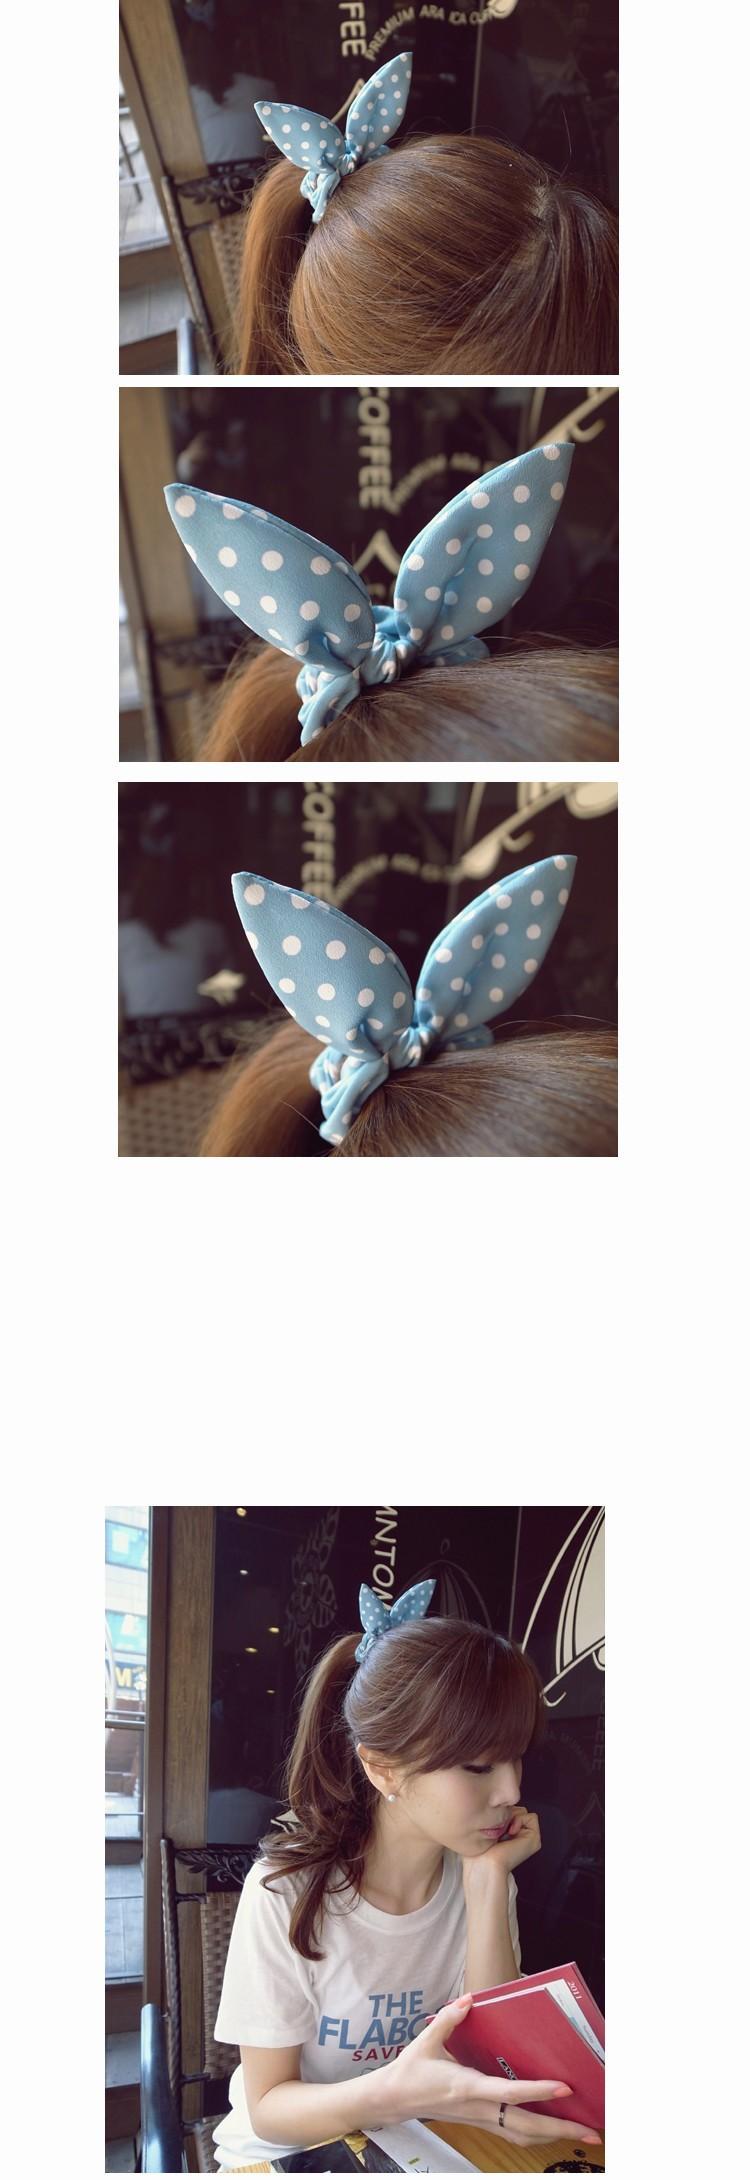 HTB1UvdFKXXXXXb6XpXXq6xXFXXXA Cute Polka Dot Rabbit Ears Hair Tie For Women - Various Styles